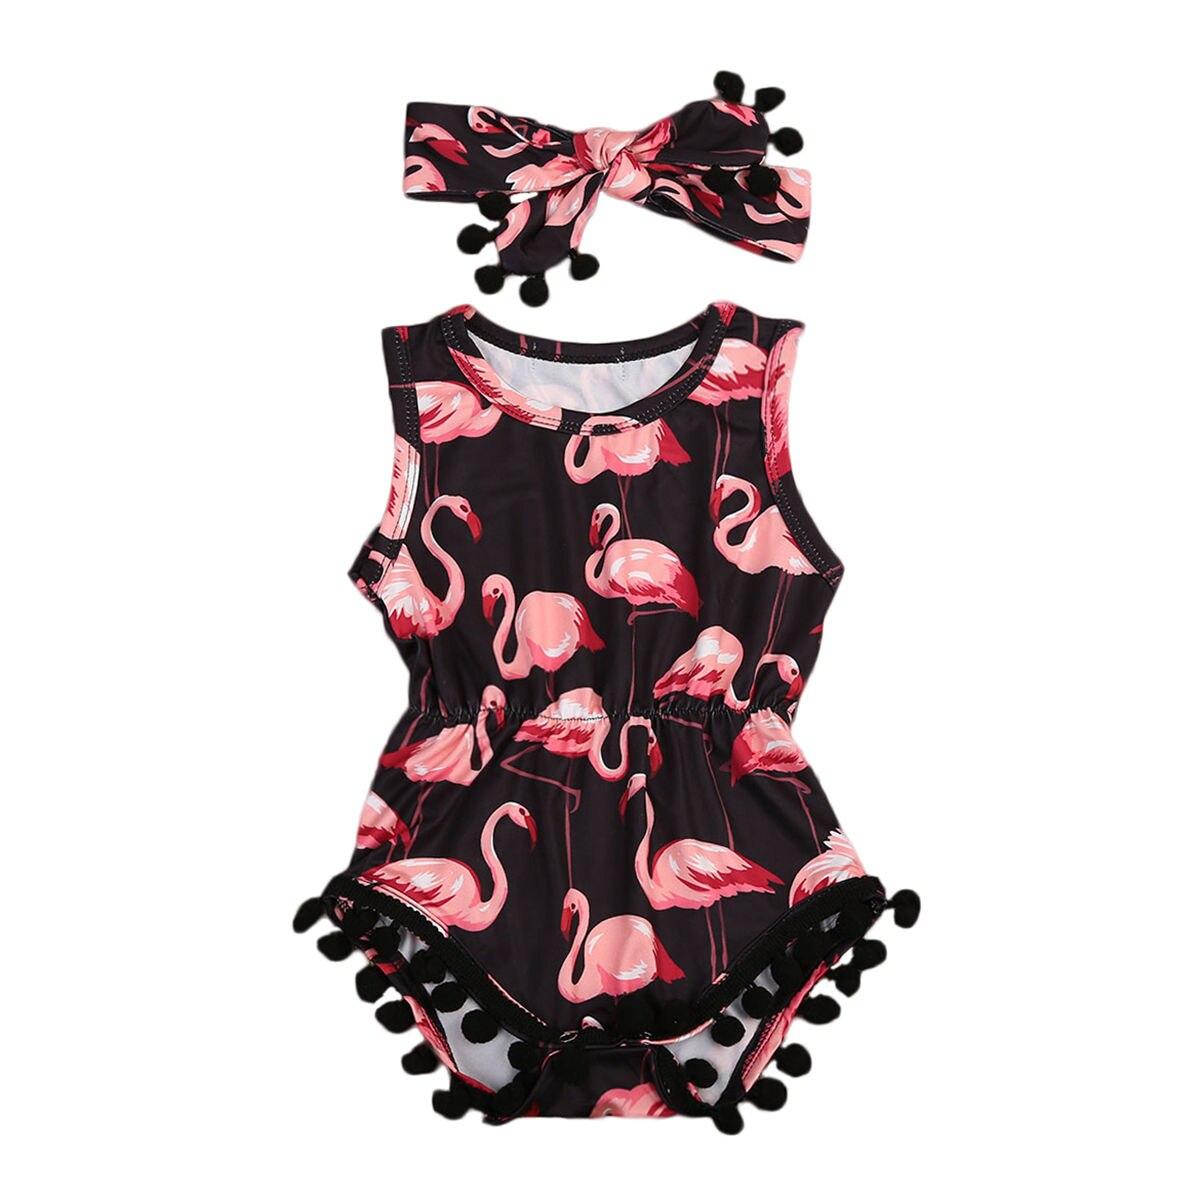 Toddler Baby Kids Girls Flamingo   Romper   Tassel Jumpsuit Headband Outfits